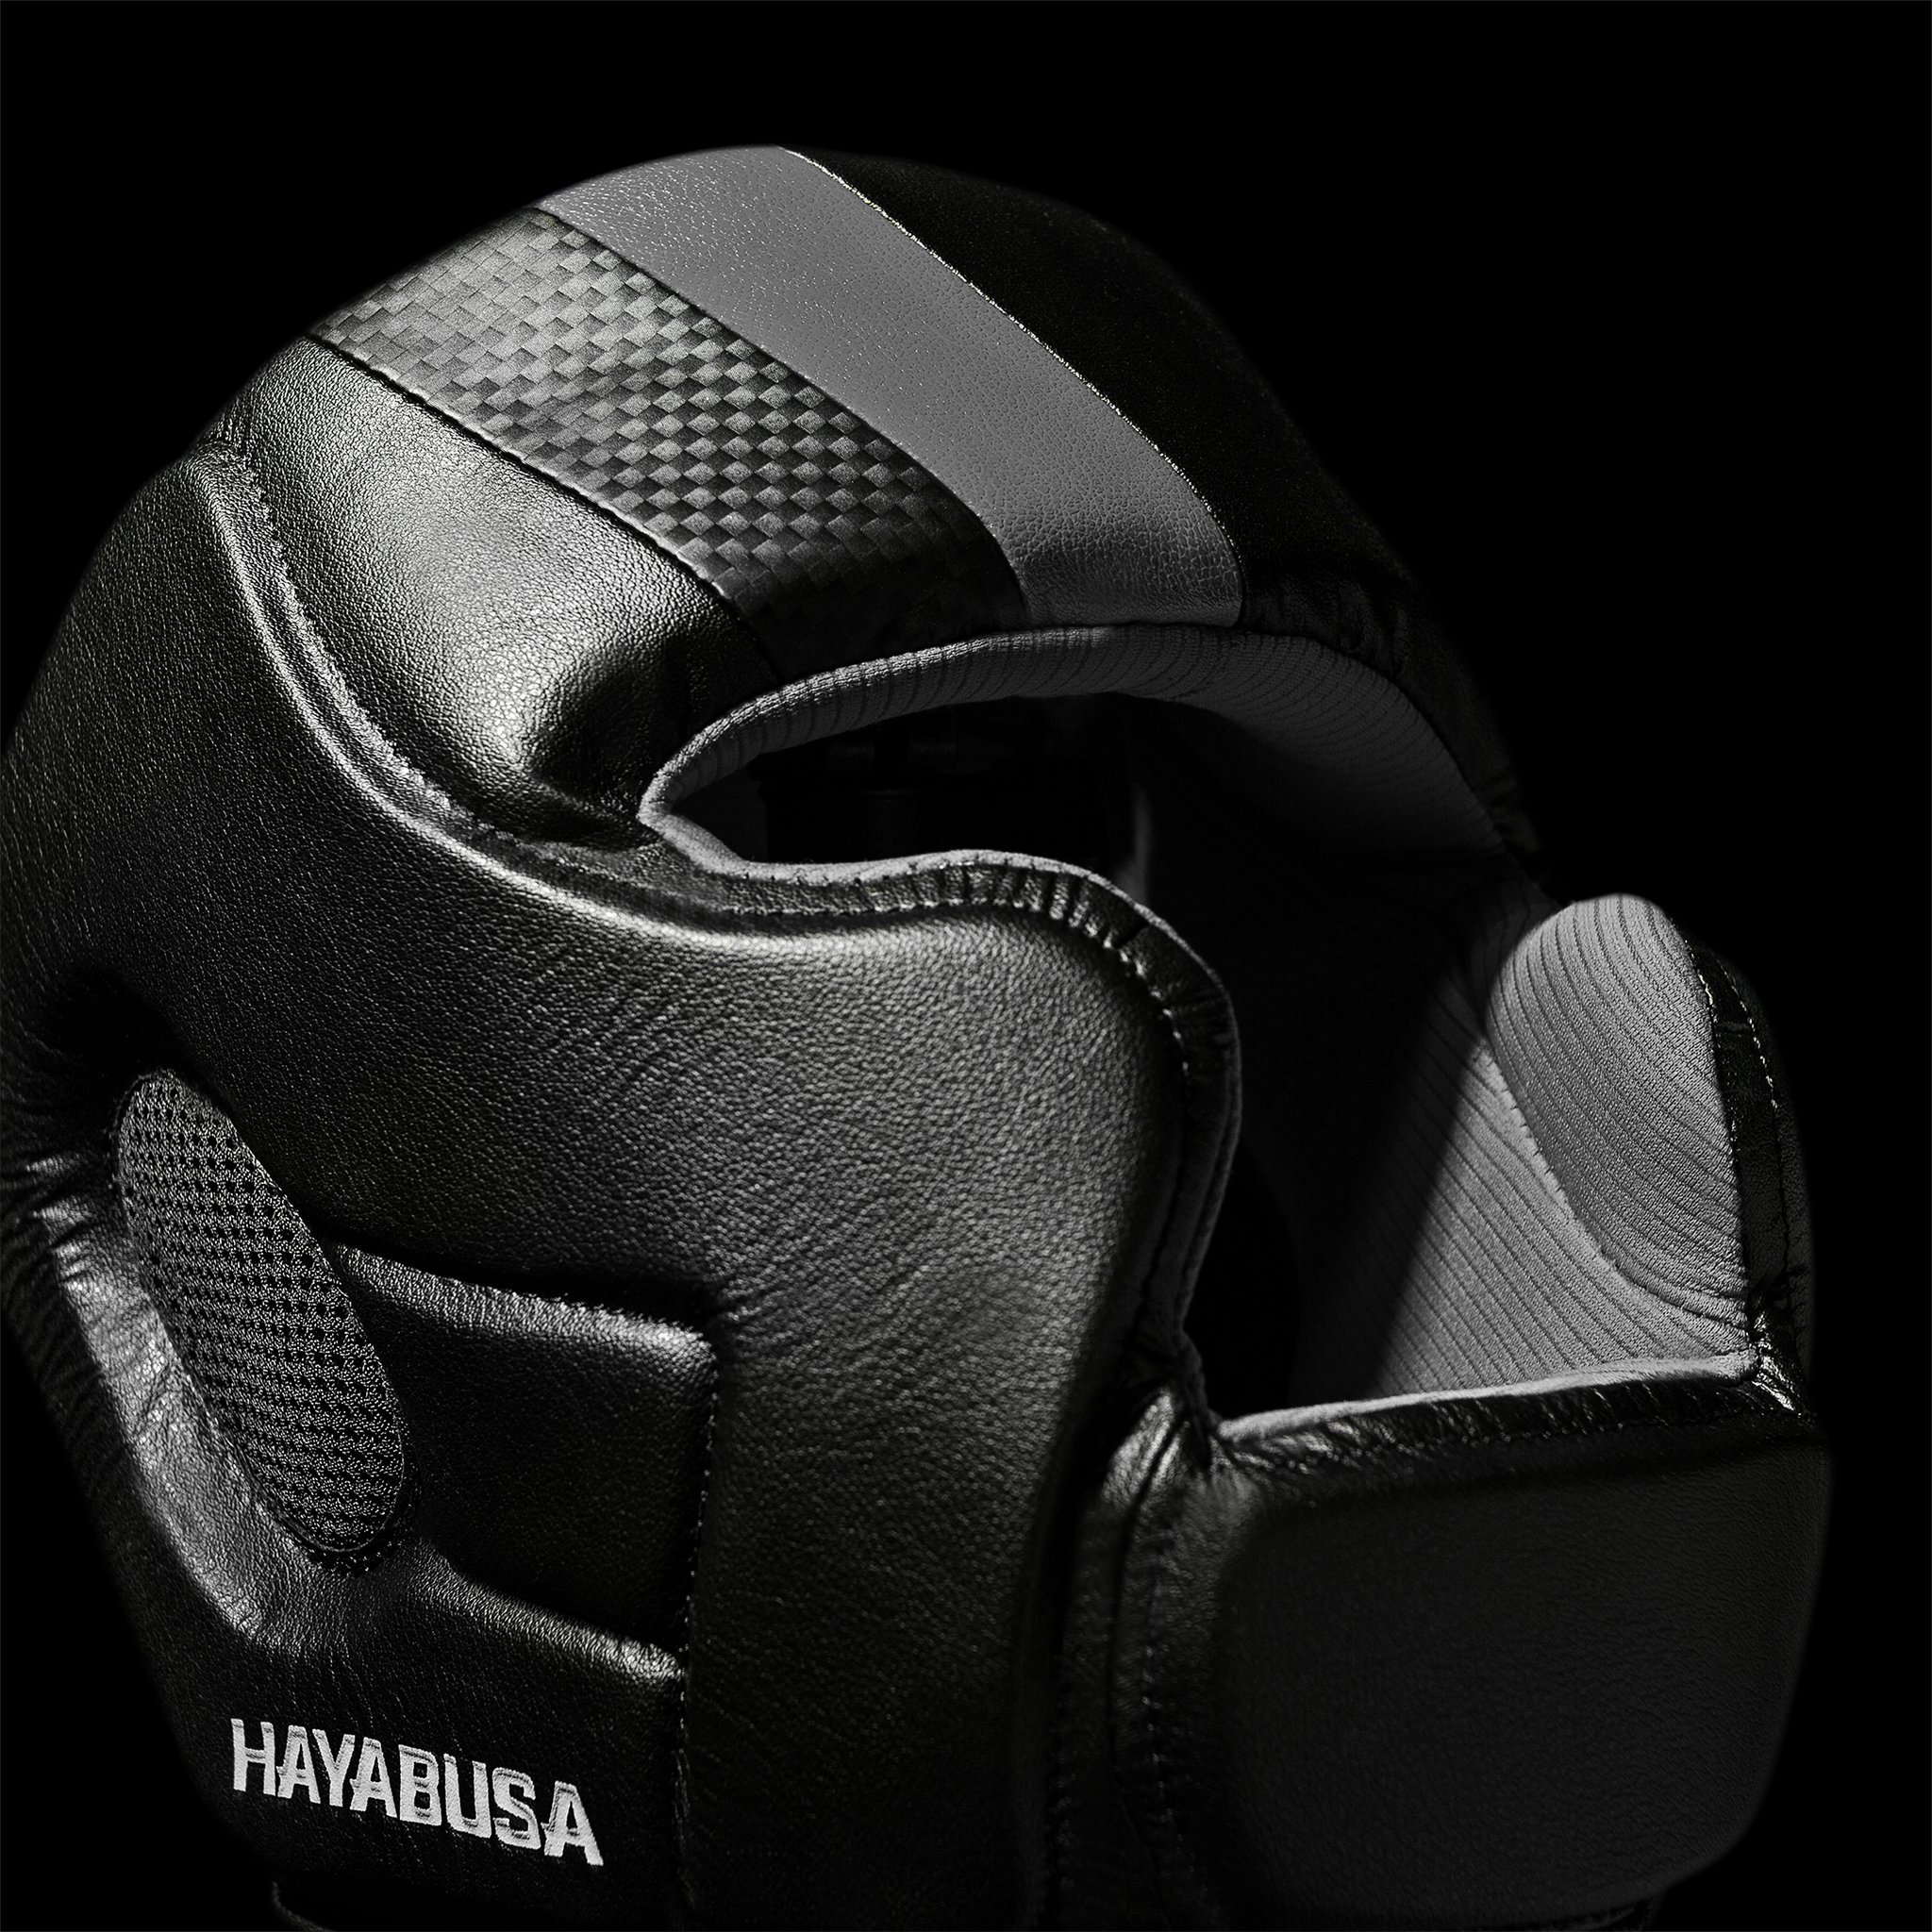 HayabusaT3 MMA and Boxing HeadgearMen and Women